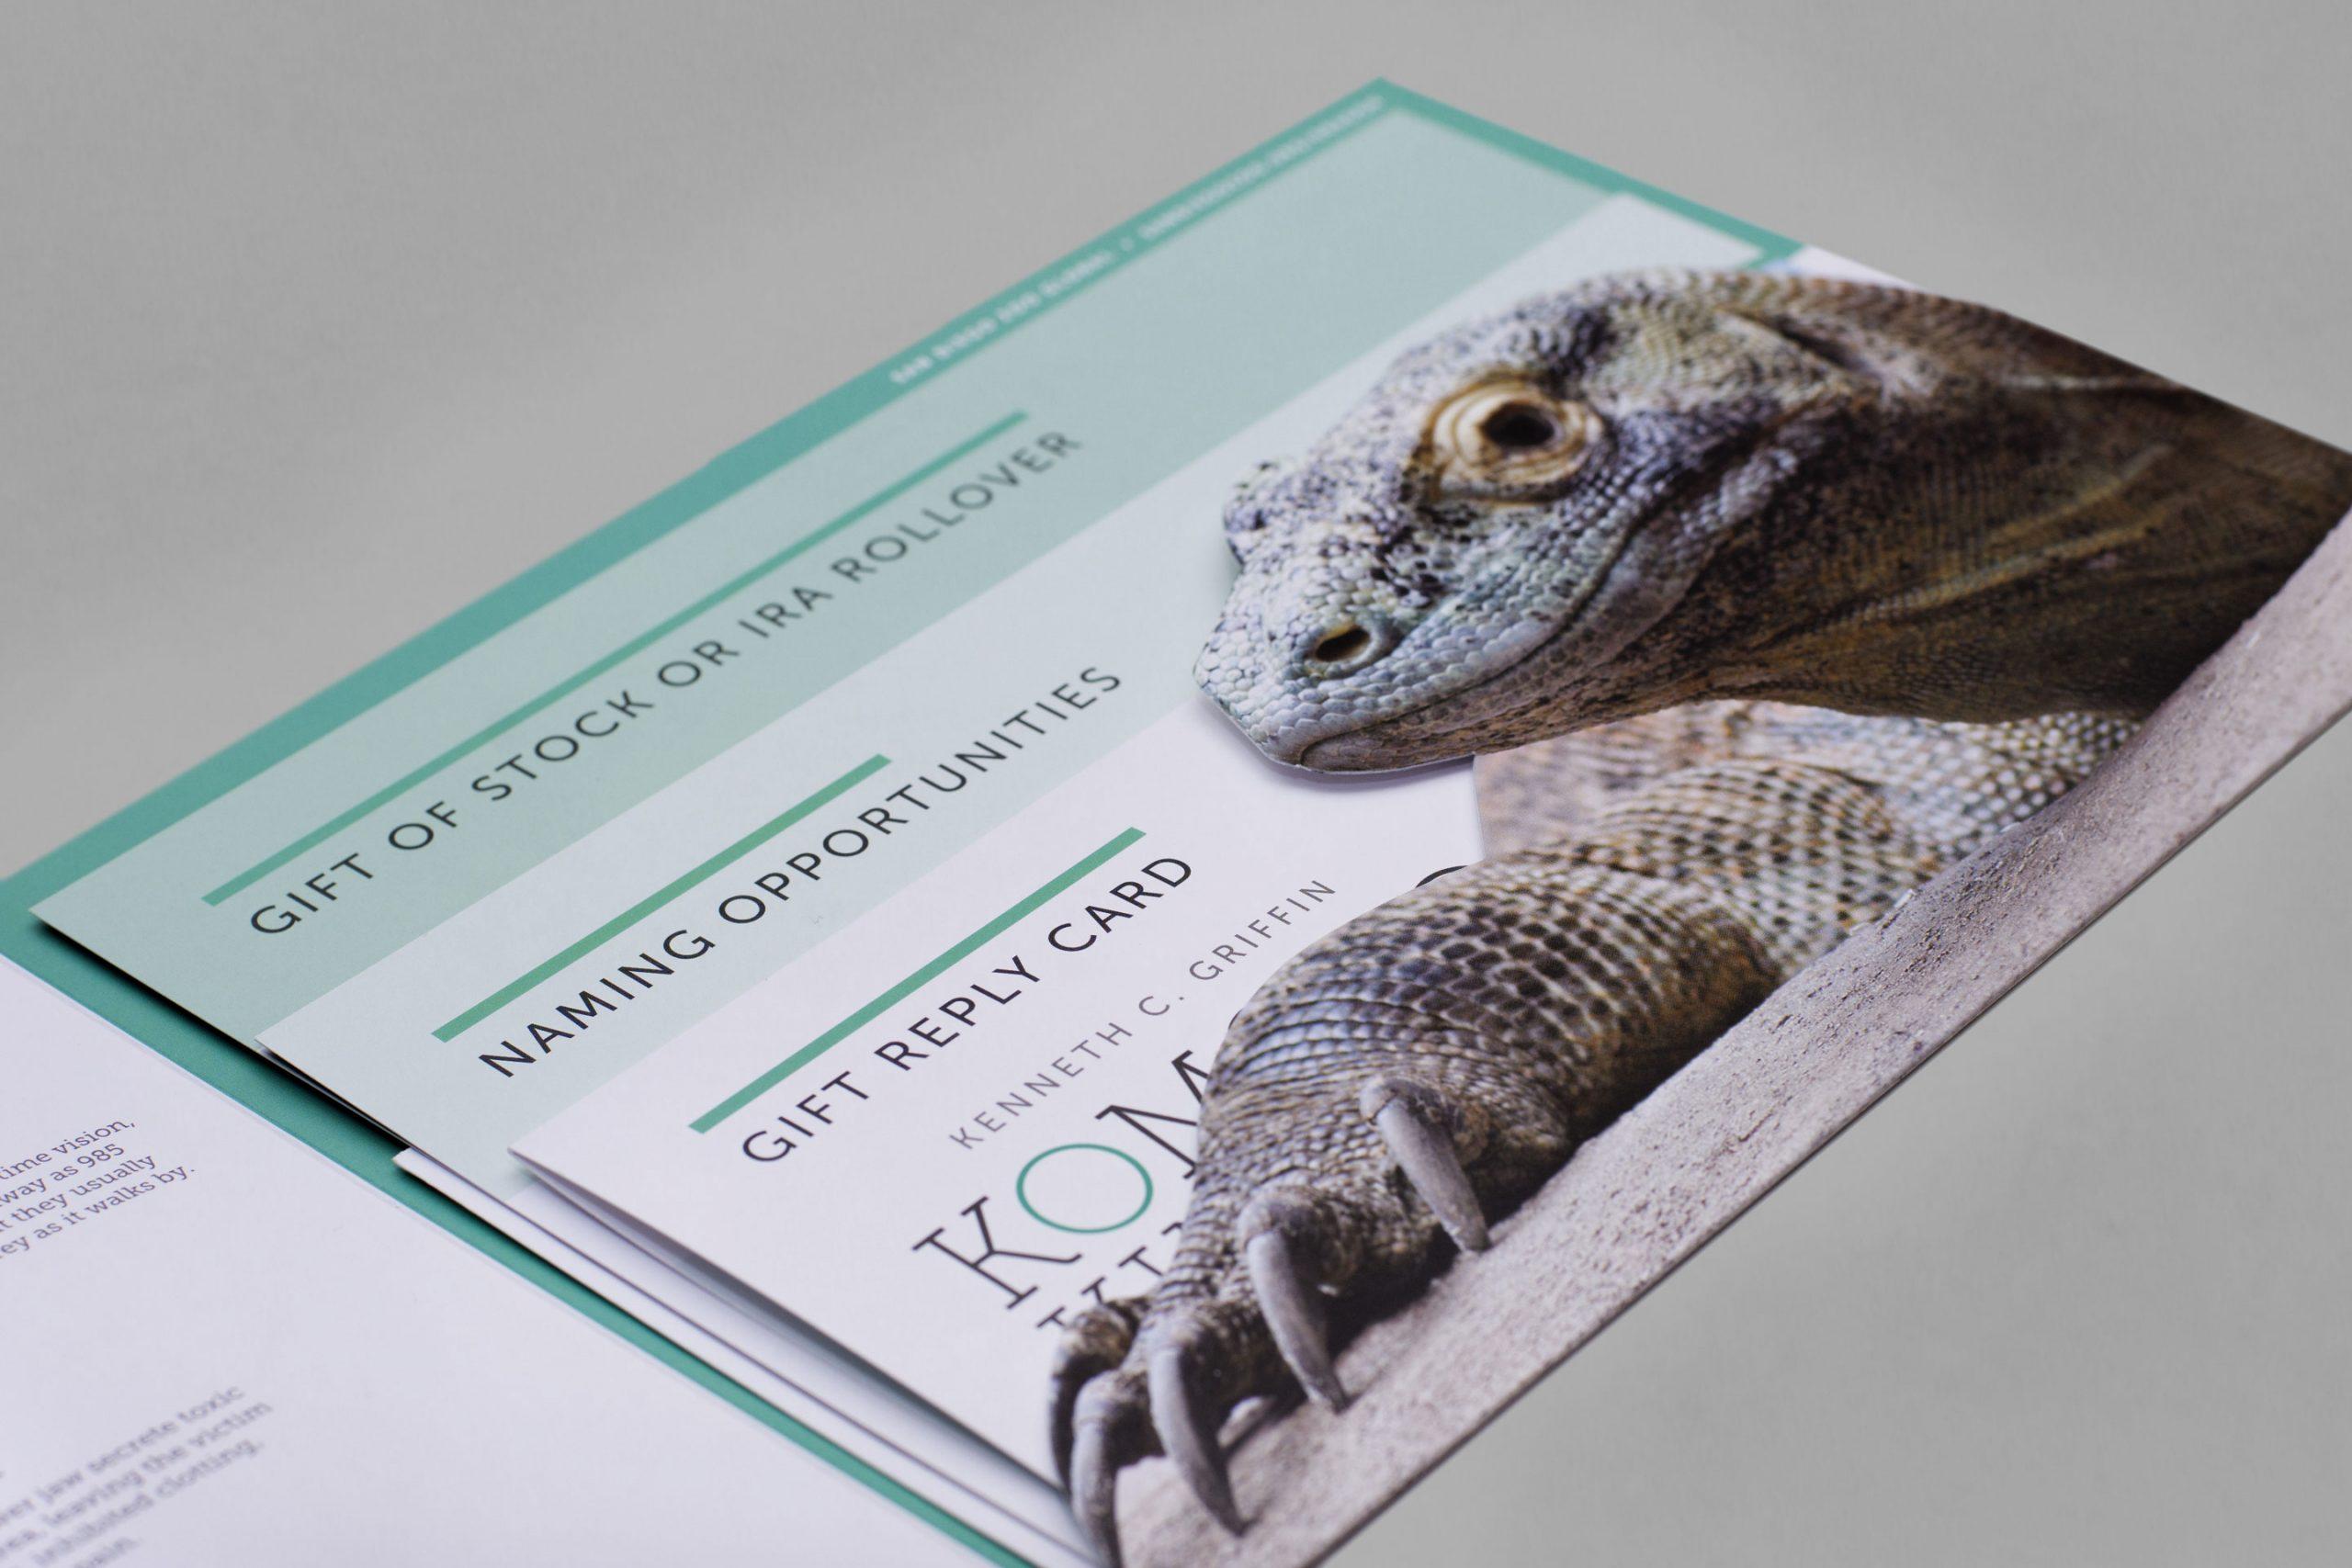 San Diego Zoo Komodo Kingdom Fundraising Appeal